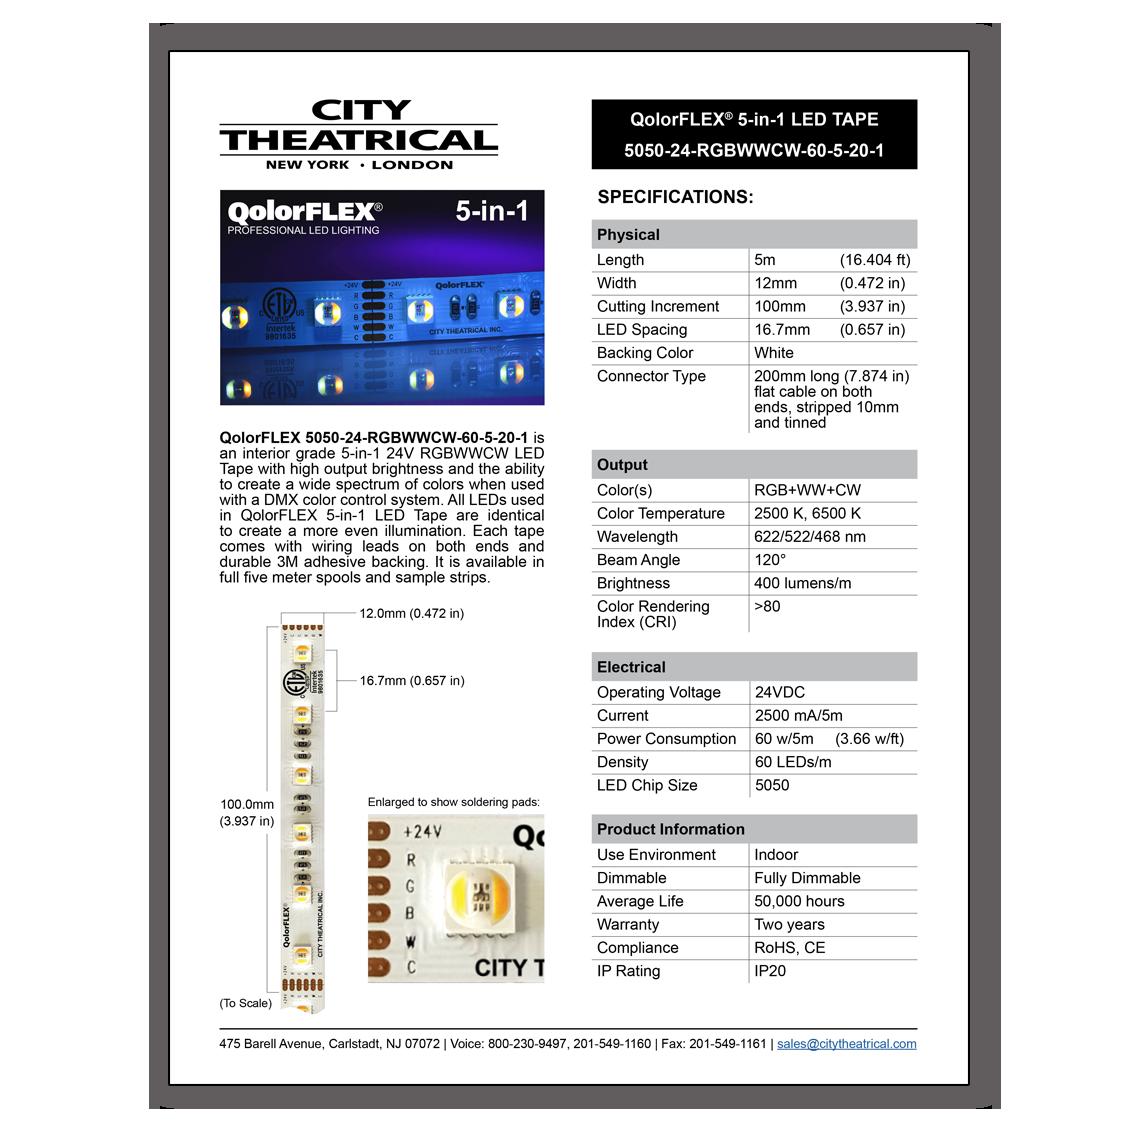 QolorFLEX 5-in-1 Cut Sheet